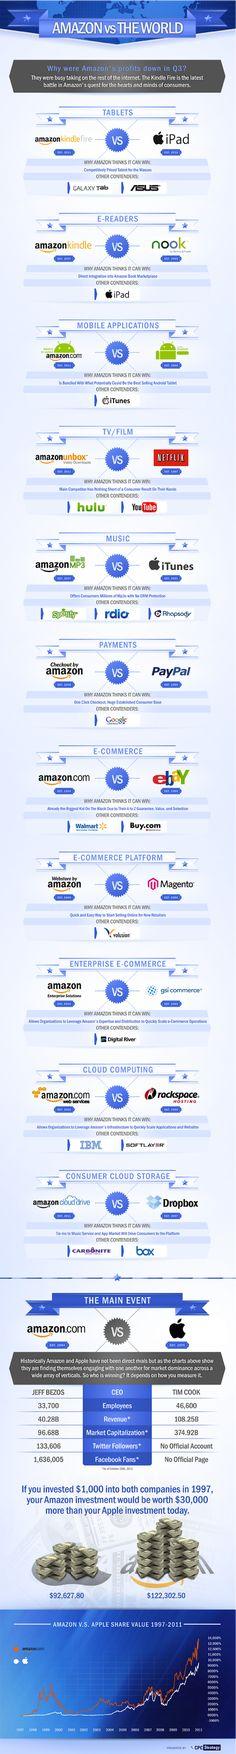 Amazon vs World